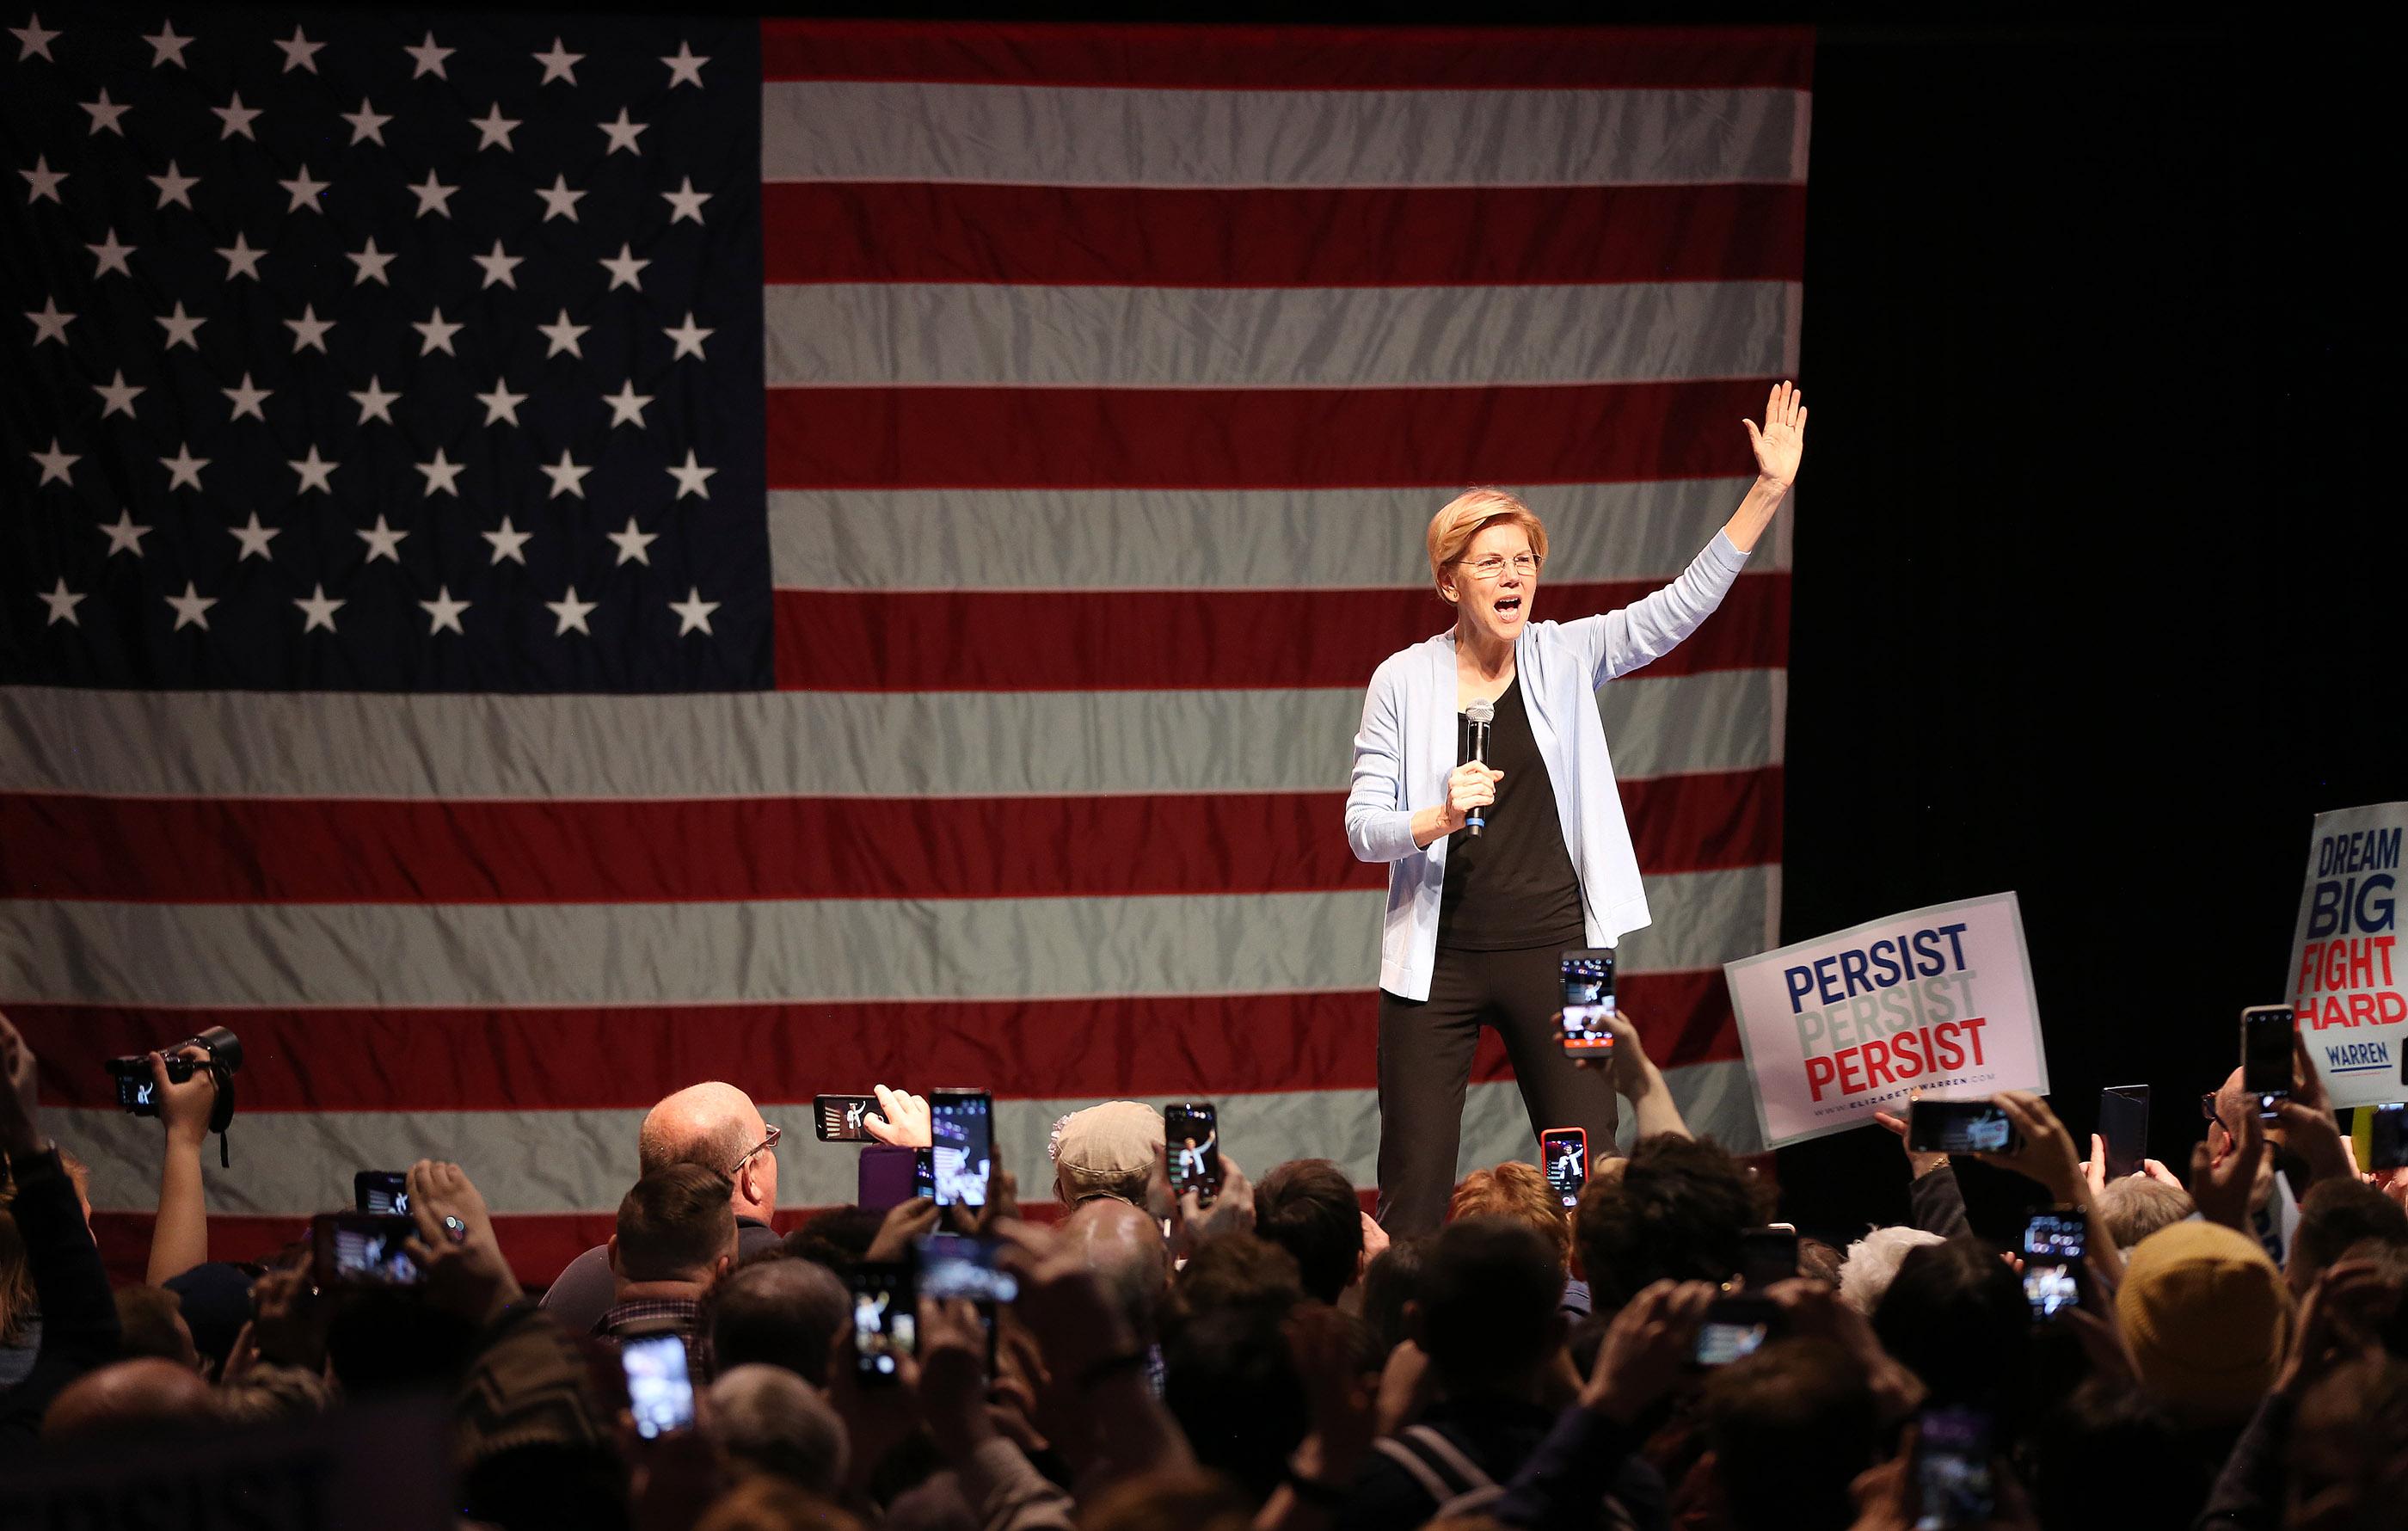 Sen. Elizabeth Warren, D-Mass., speaks in Salt Lake City on Wednesday, April 17, 2019.